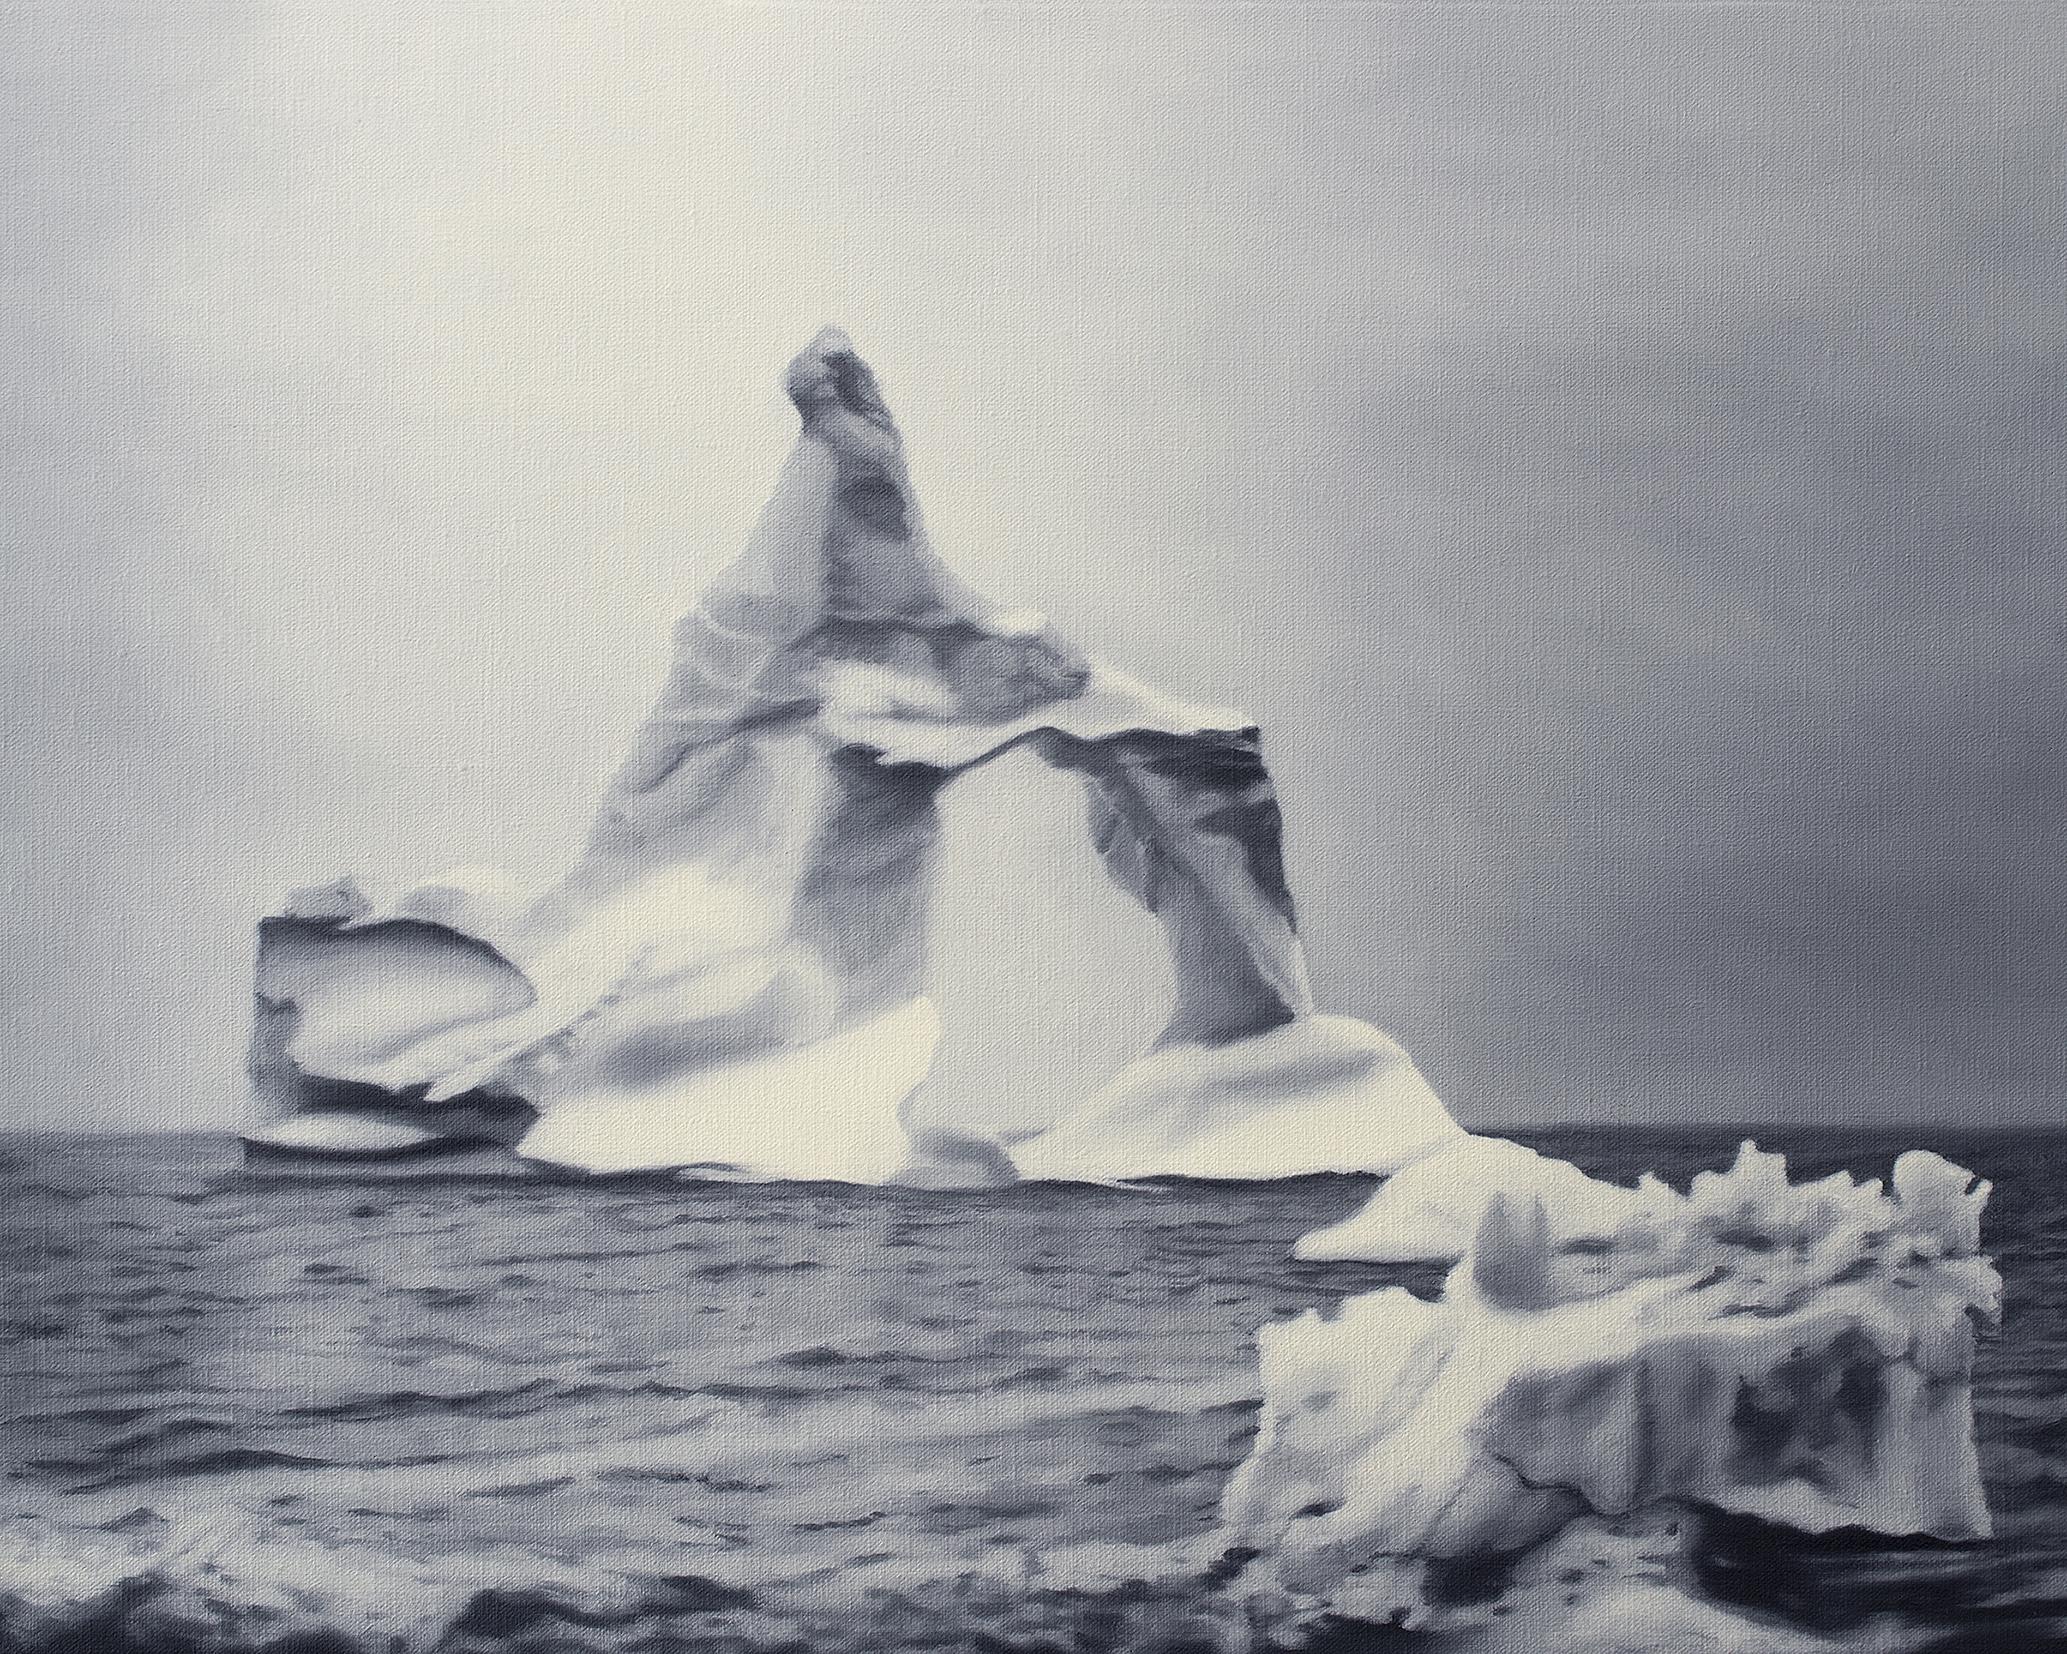 Torbjörn Limé - Ice berg (Isberg), oil on canvas